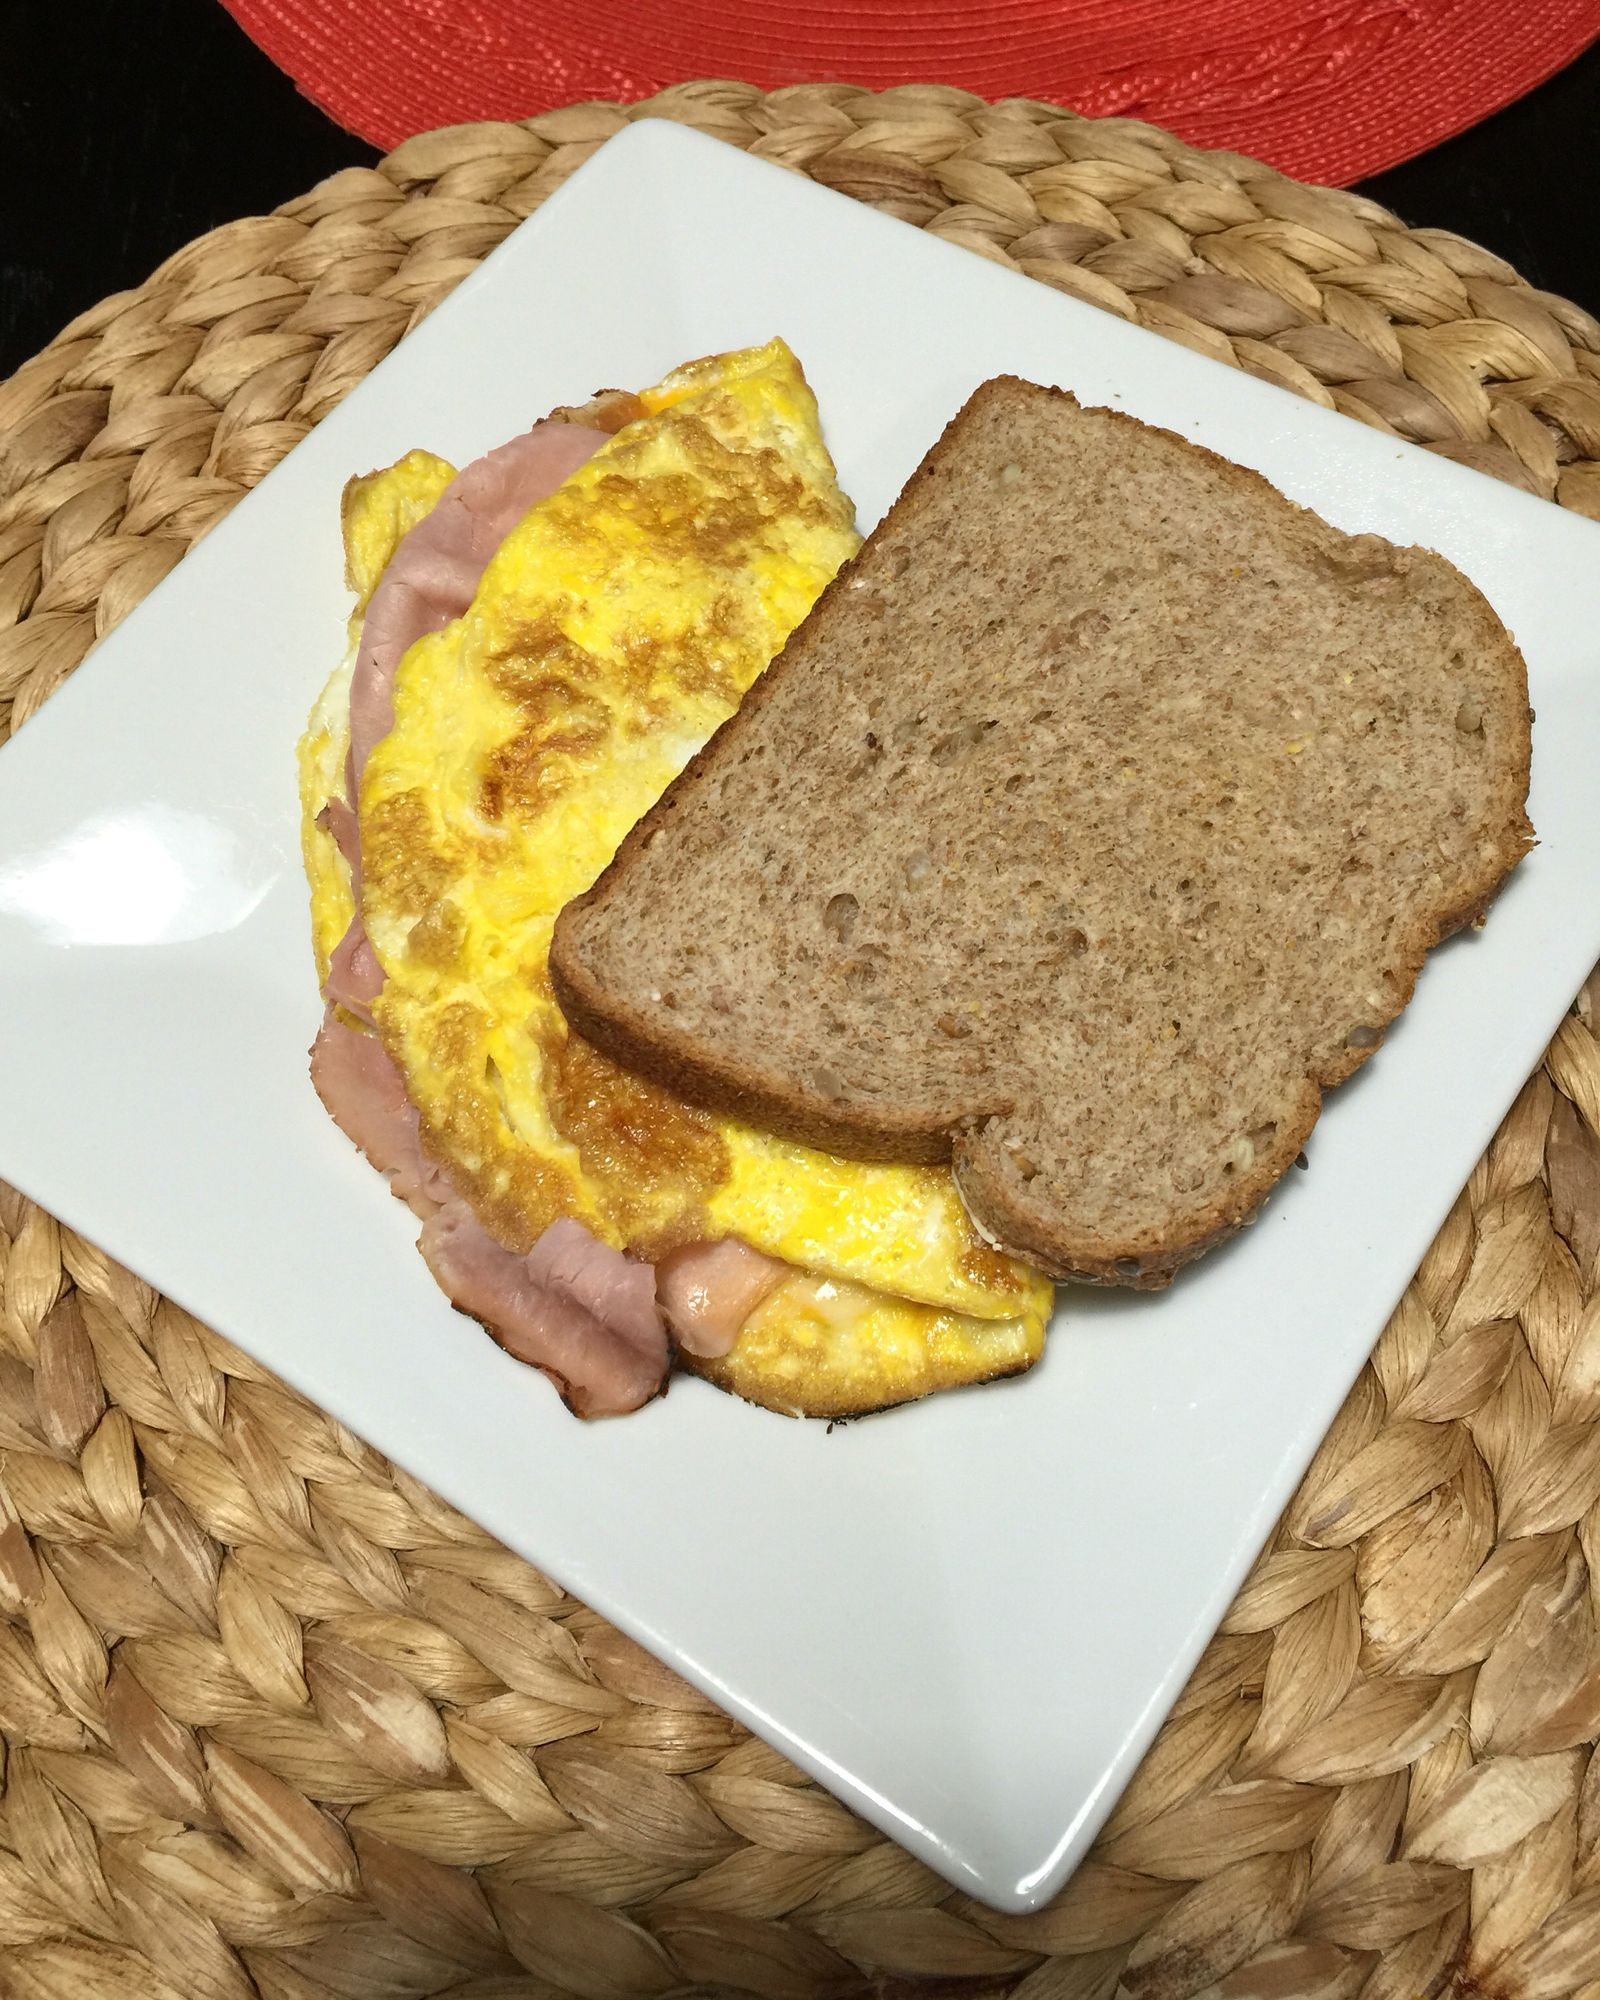 Omelet y pan integral para desayunar.